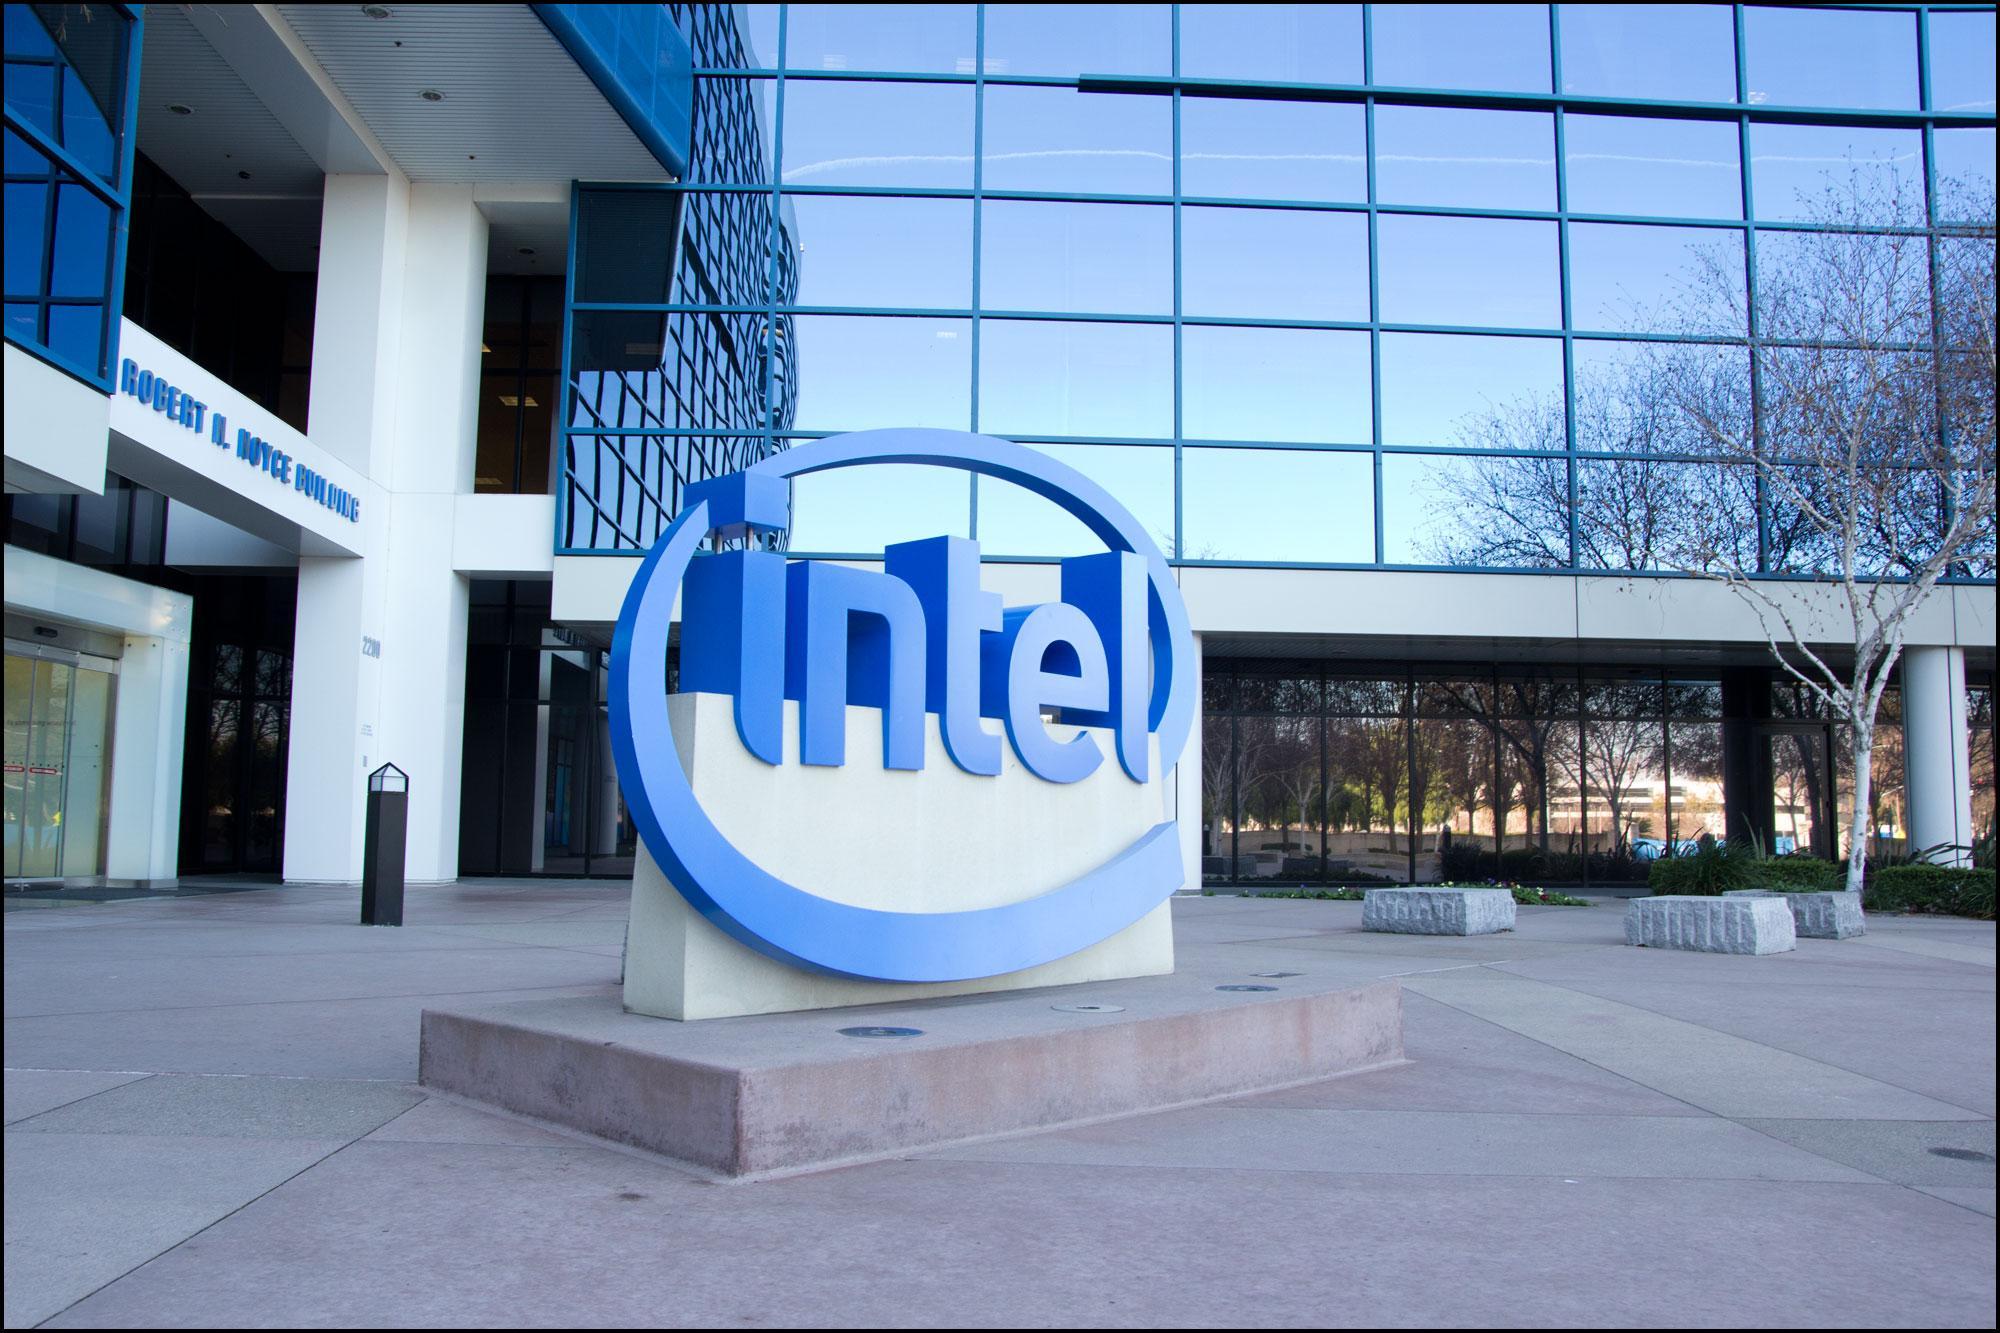 Intels lokaler i Silicon Valley